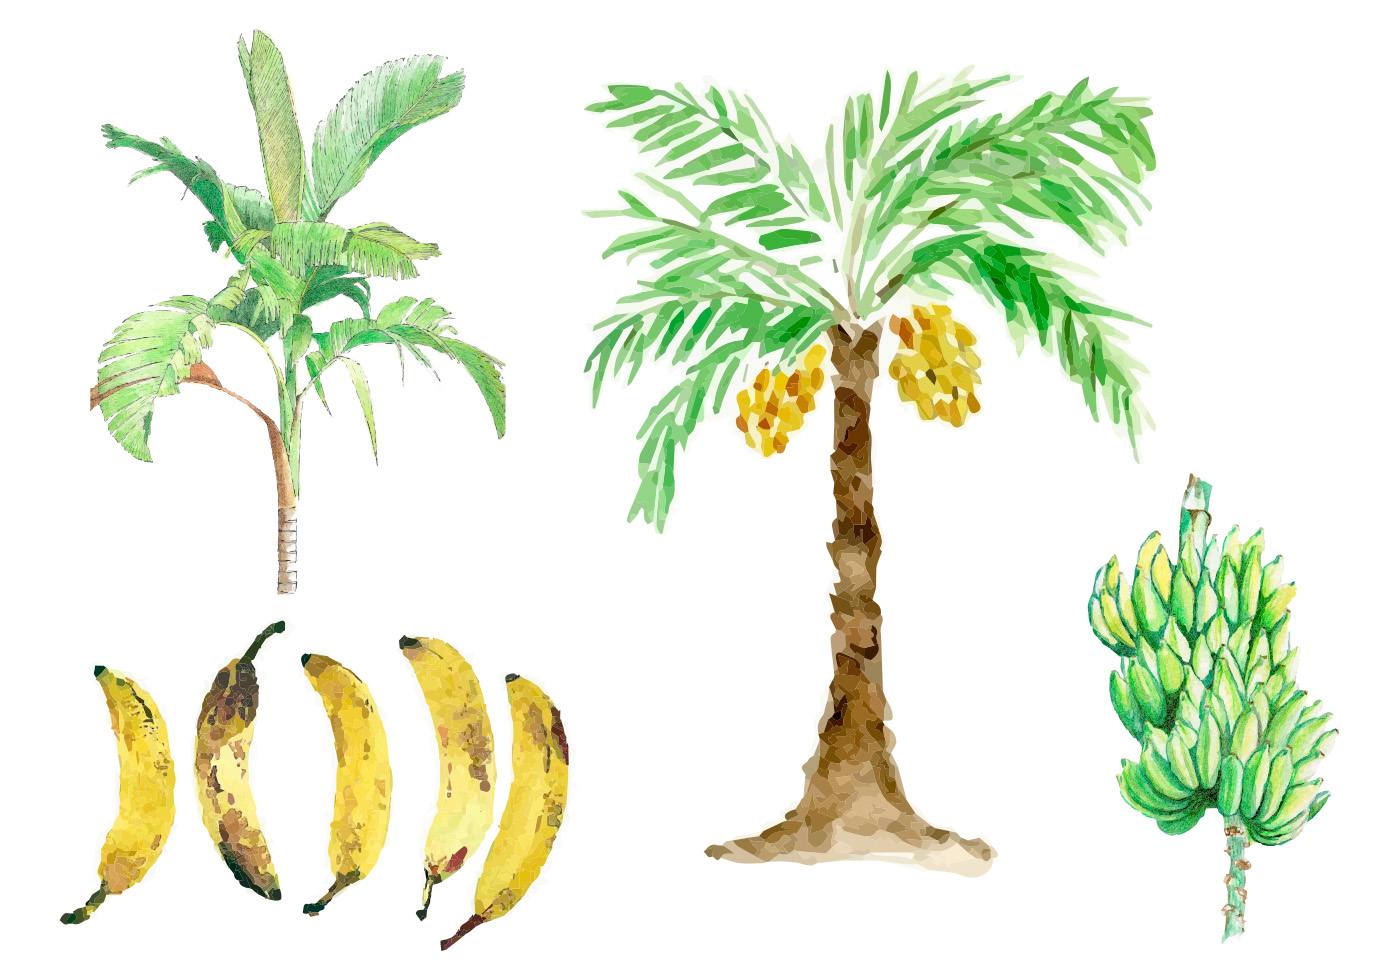 Watercolor Banana Tree Vectors - Download Free Vector Art ...